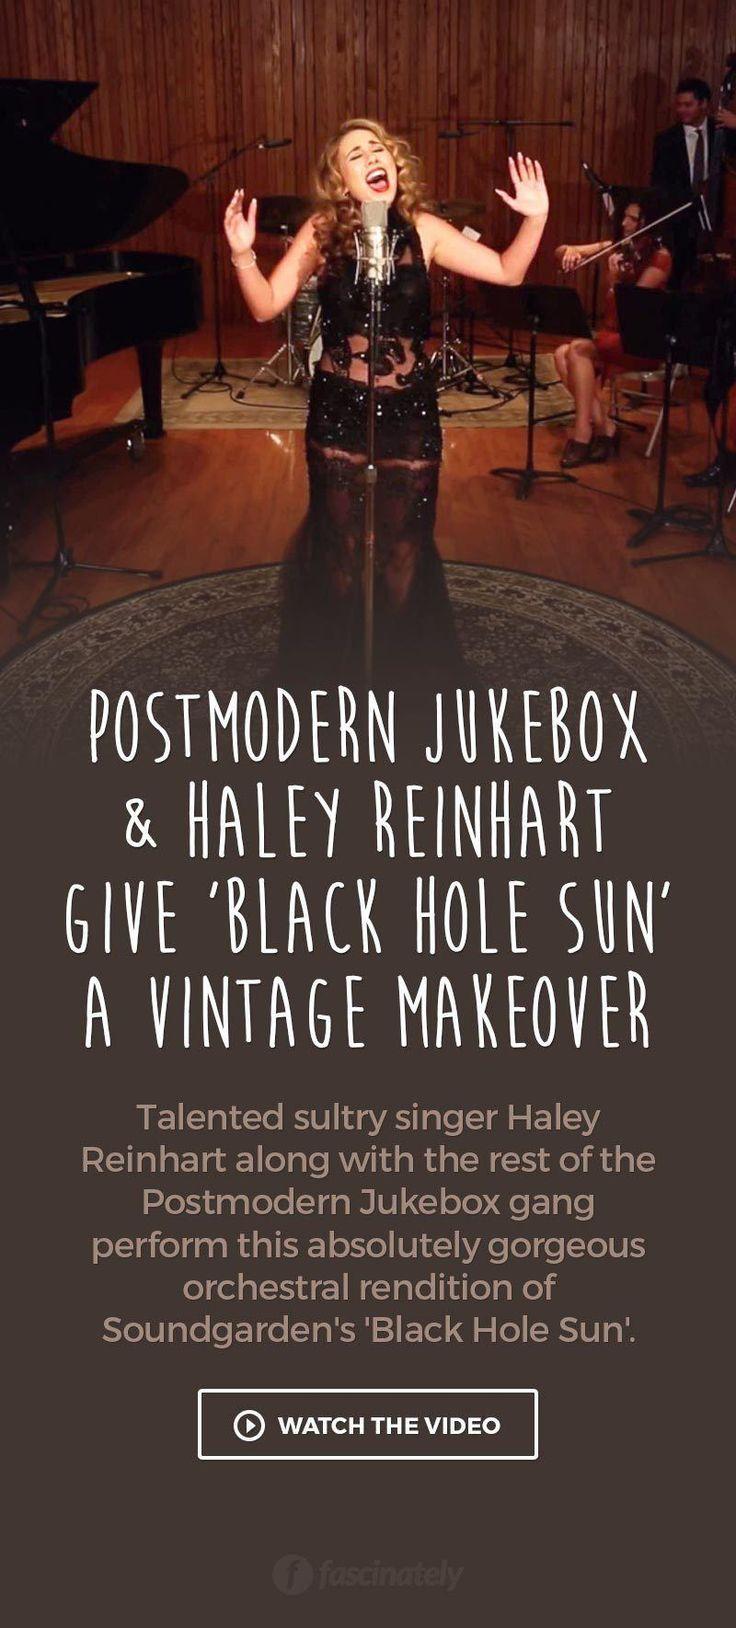 "Postmodern Jukebox & Haley Reinhart Give ""Black Hole Sun"" a Vintage Makeover"